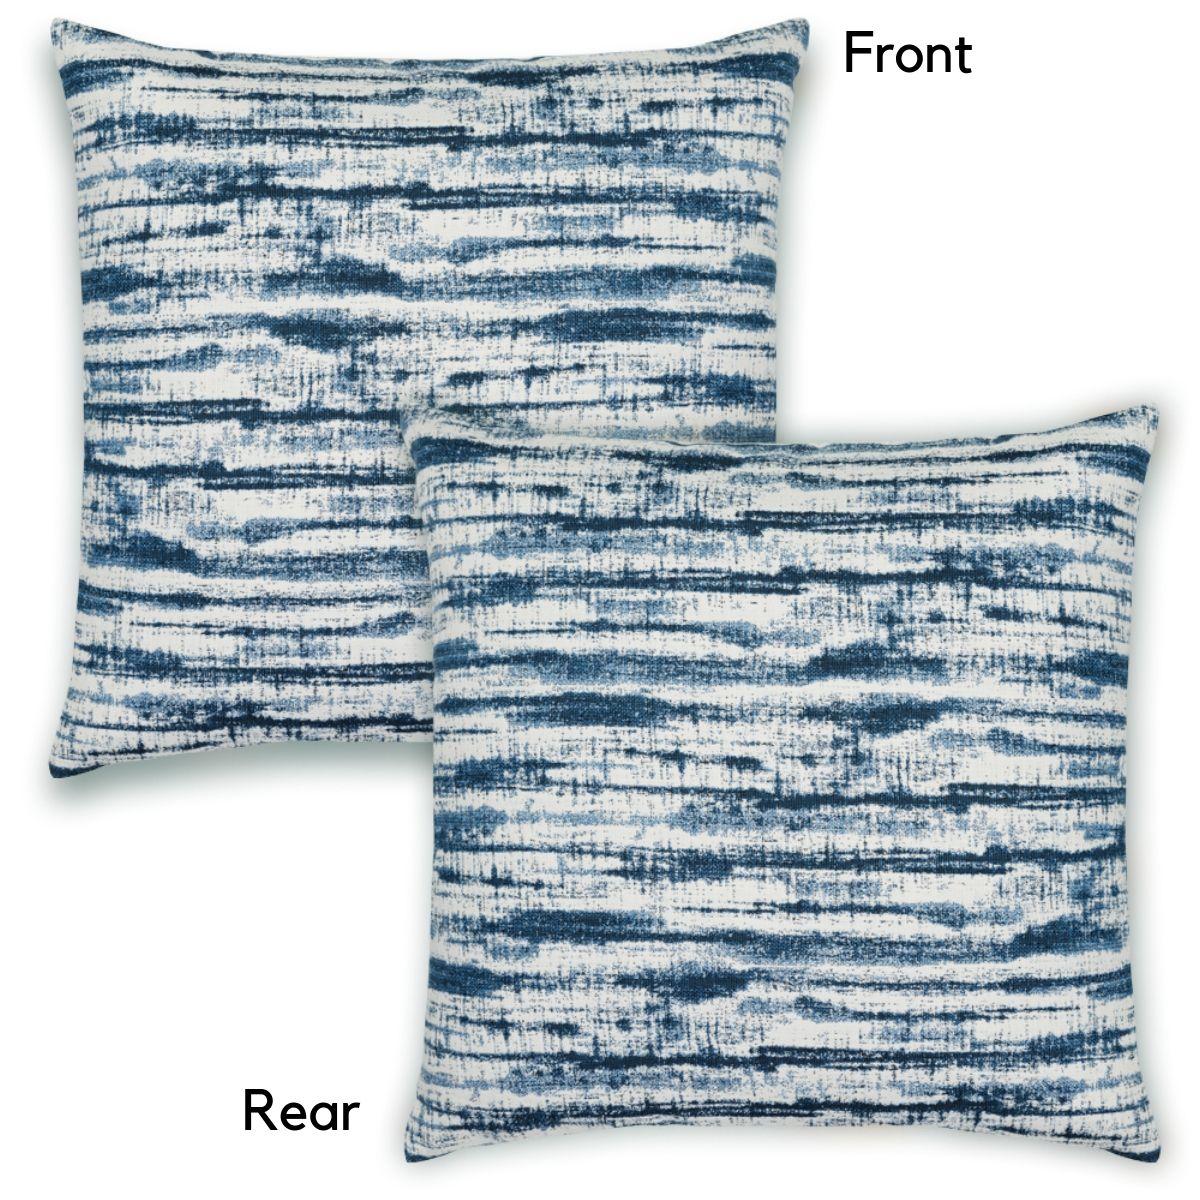 Elaine Smith Linear Indigo Pillow Back Side View